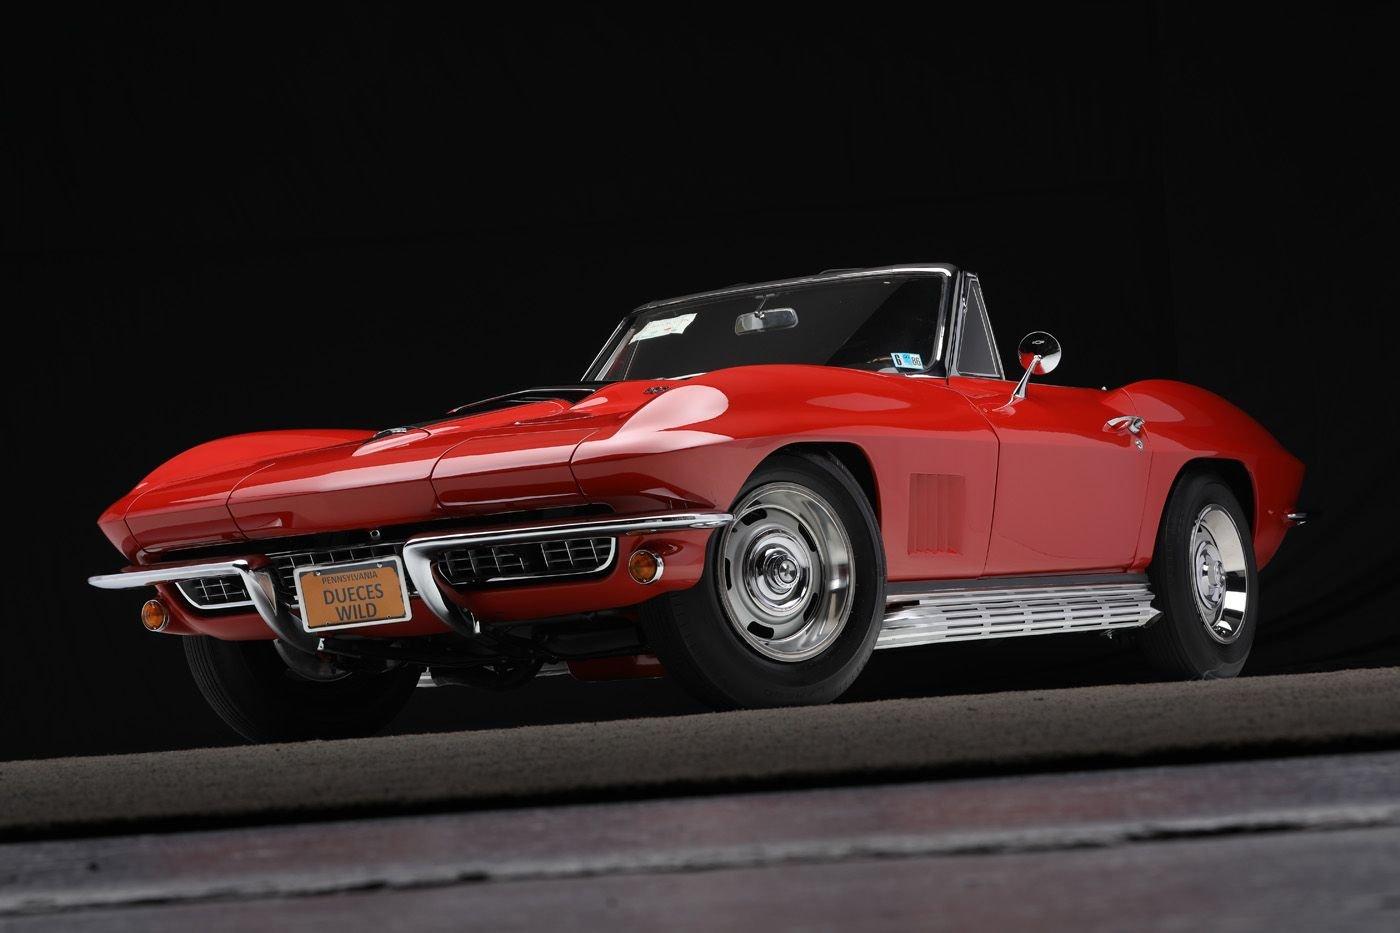 1967 chevrolet corvette 435 aka dueces wild